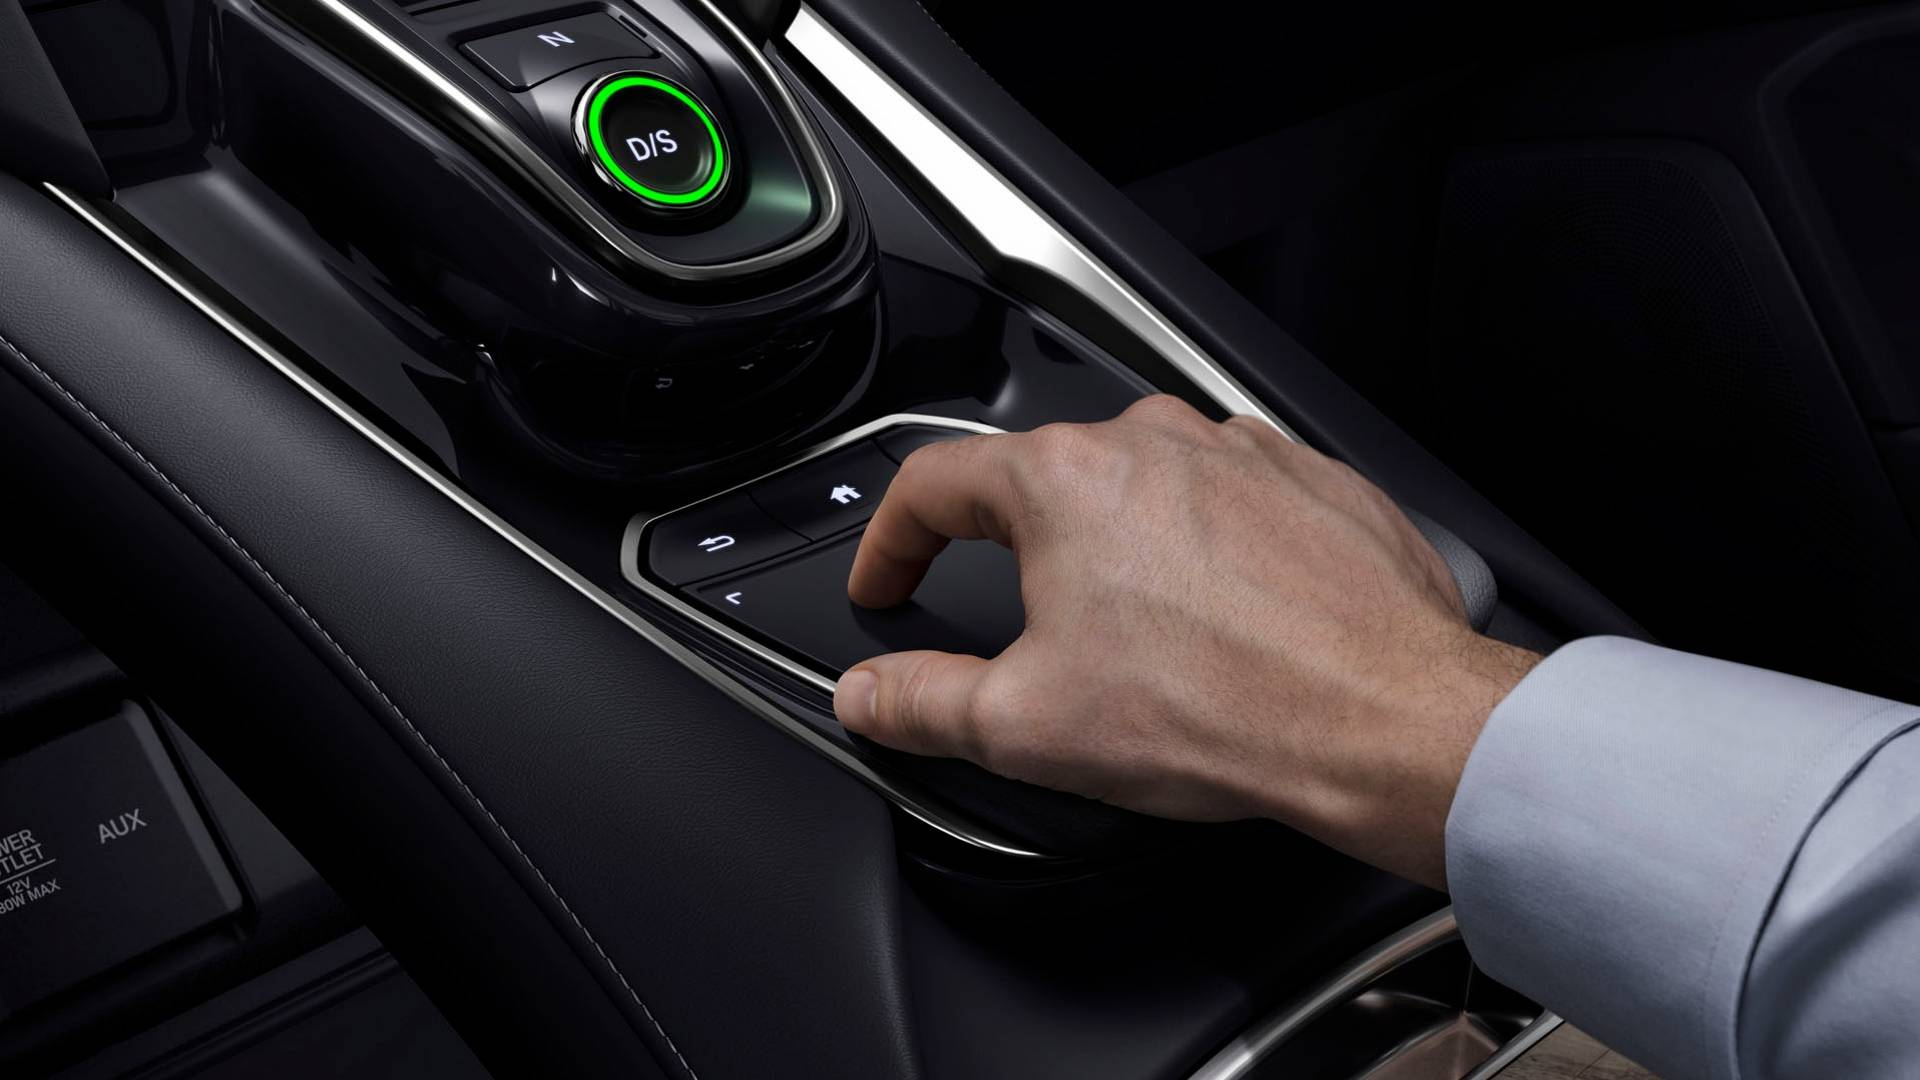 2019 Acura RDX Makes World Debut In NY, Boasts 2.0-liter VTEC Turbo Engine - autoevolution